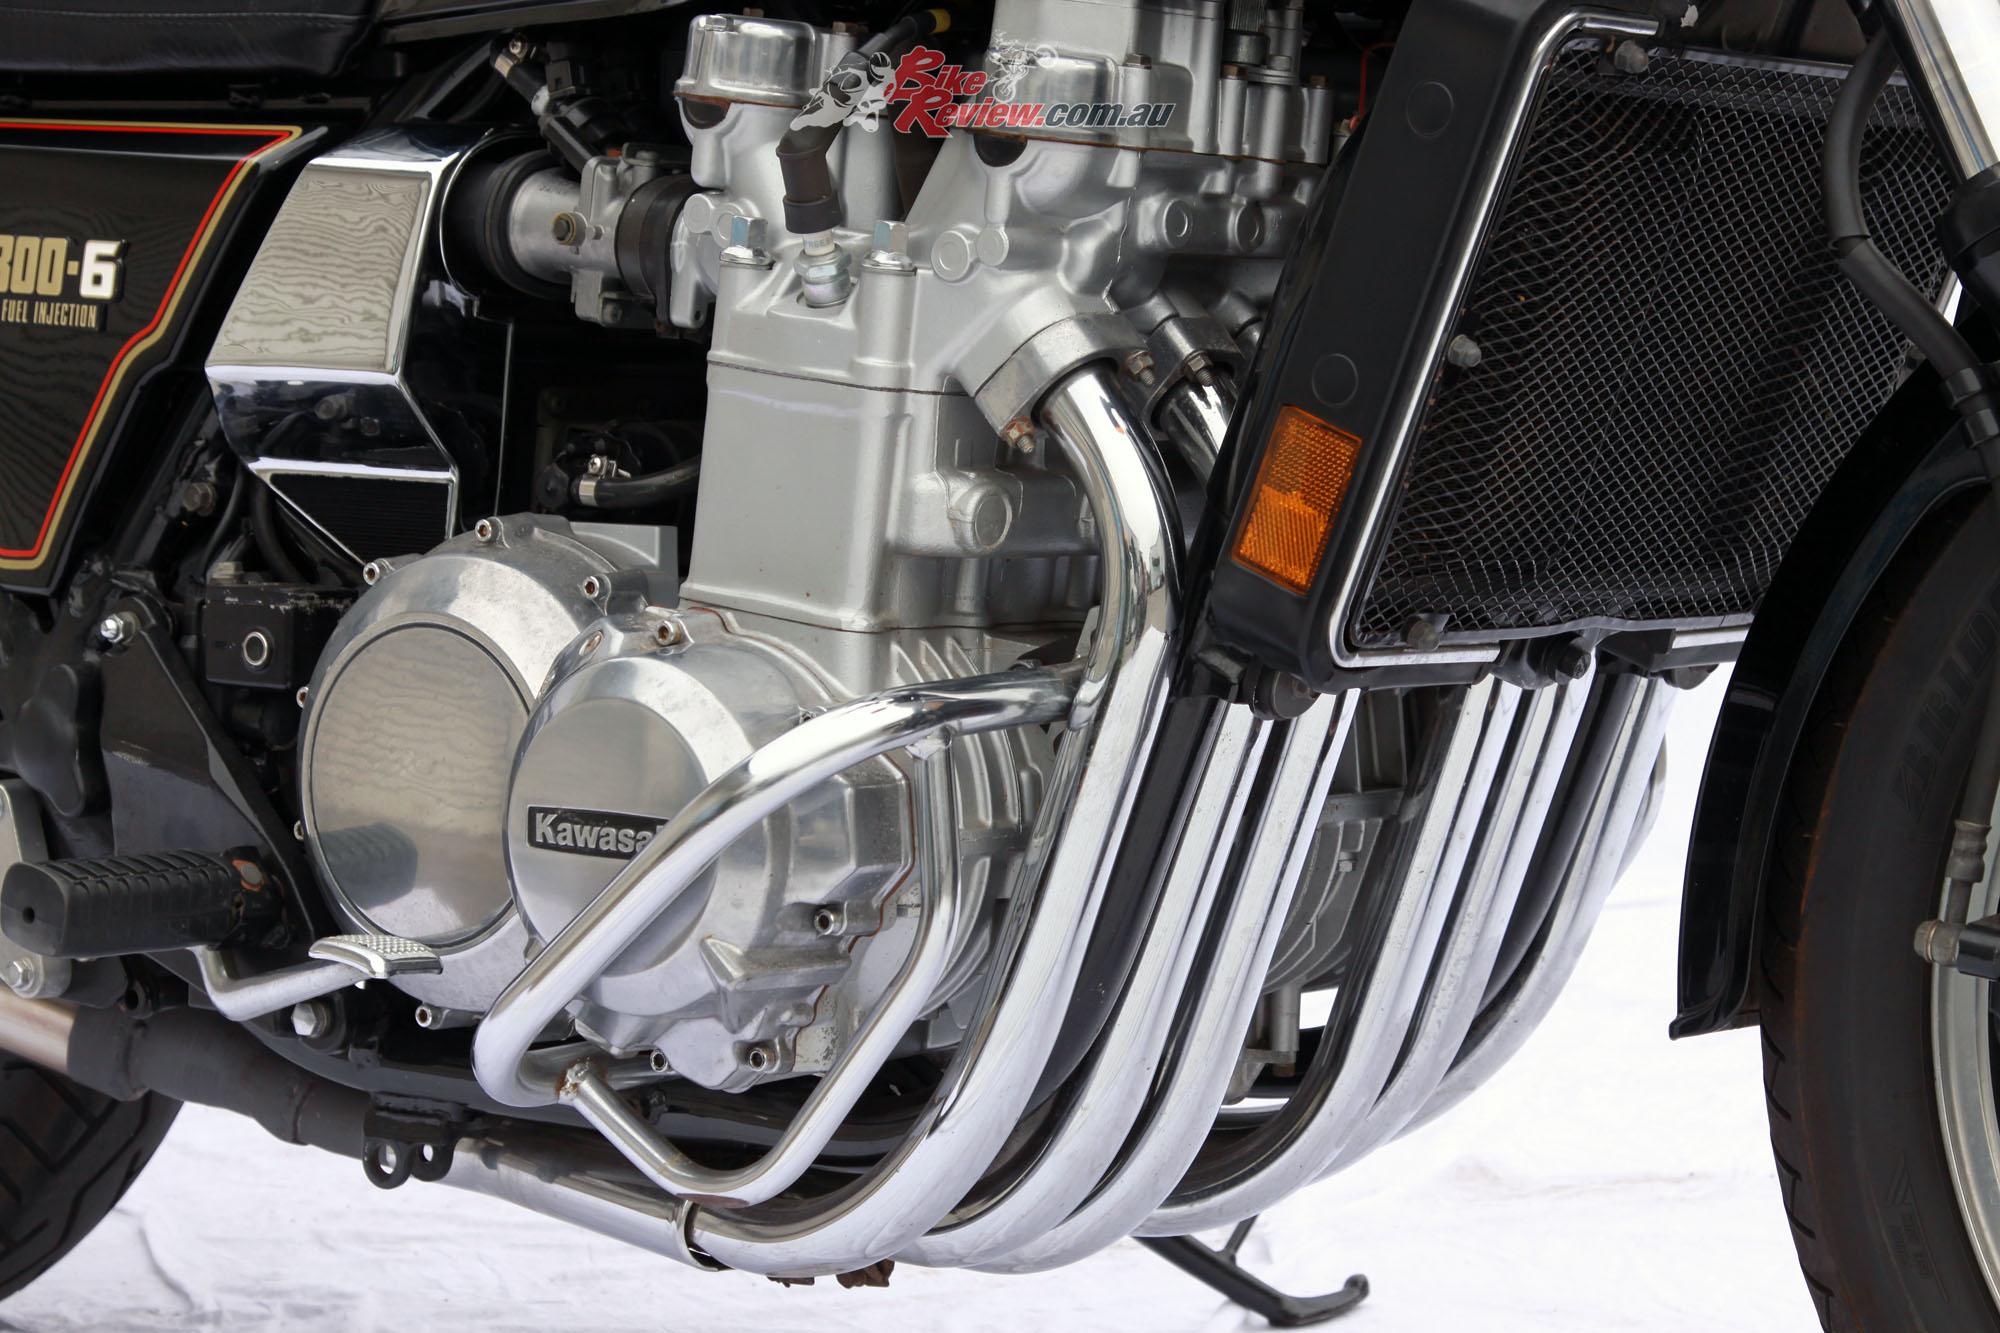 Classic Collectable: Kawasaki Z1300 Six - Bike Review